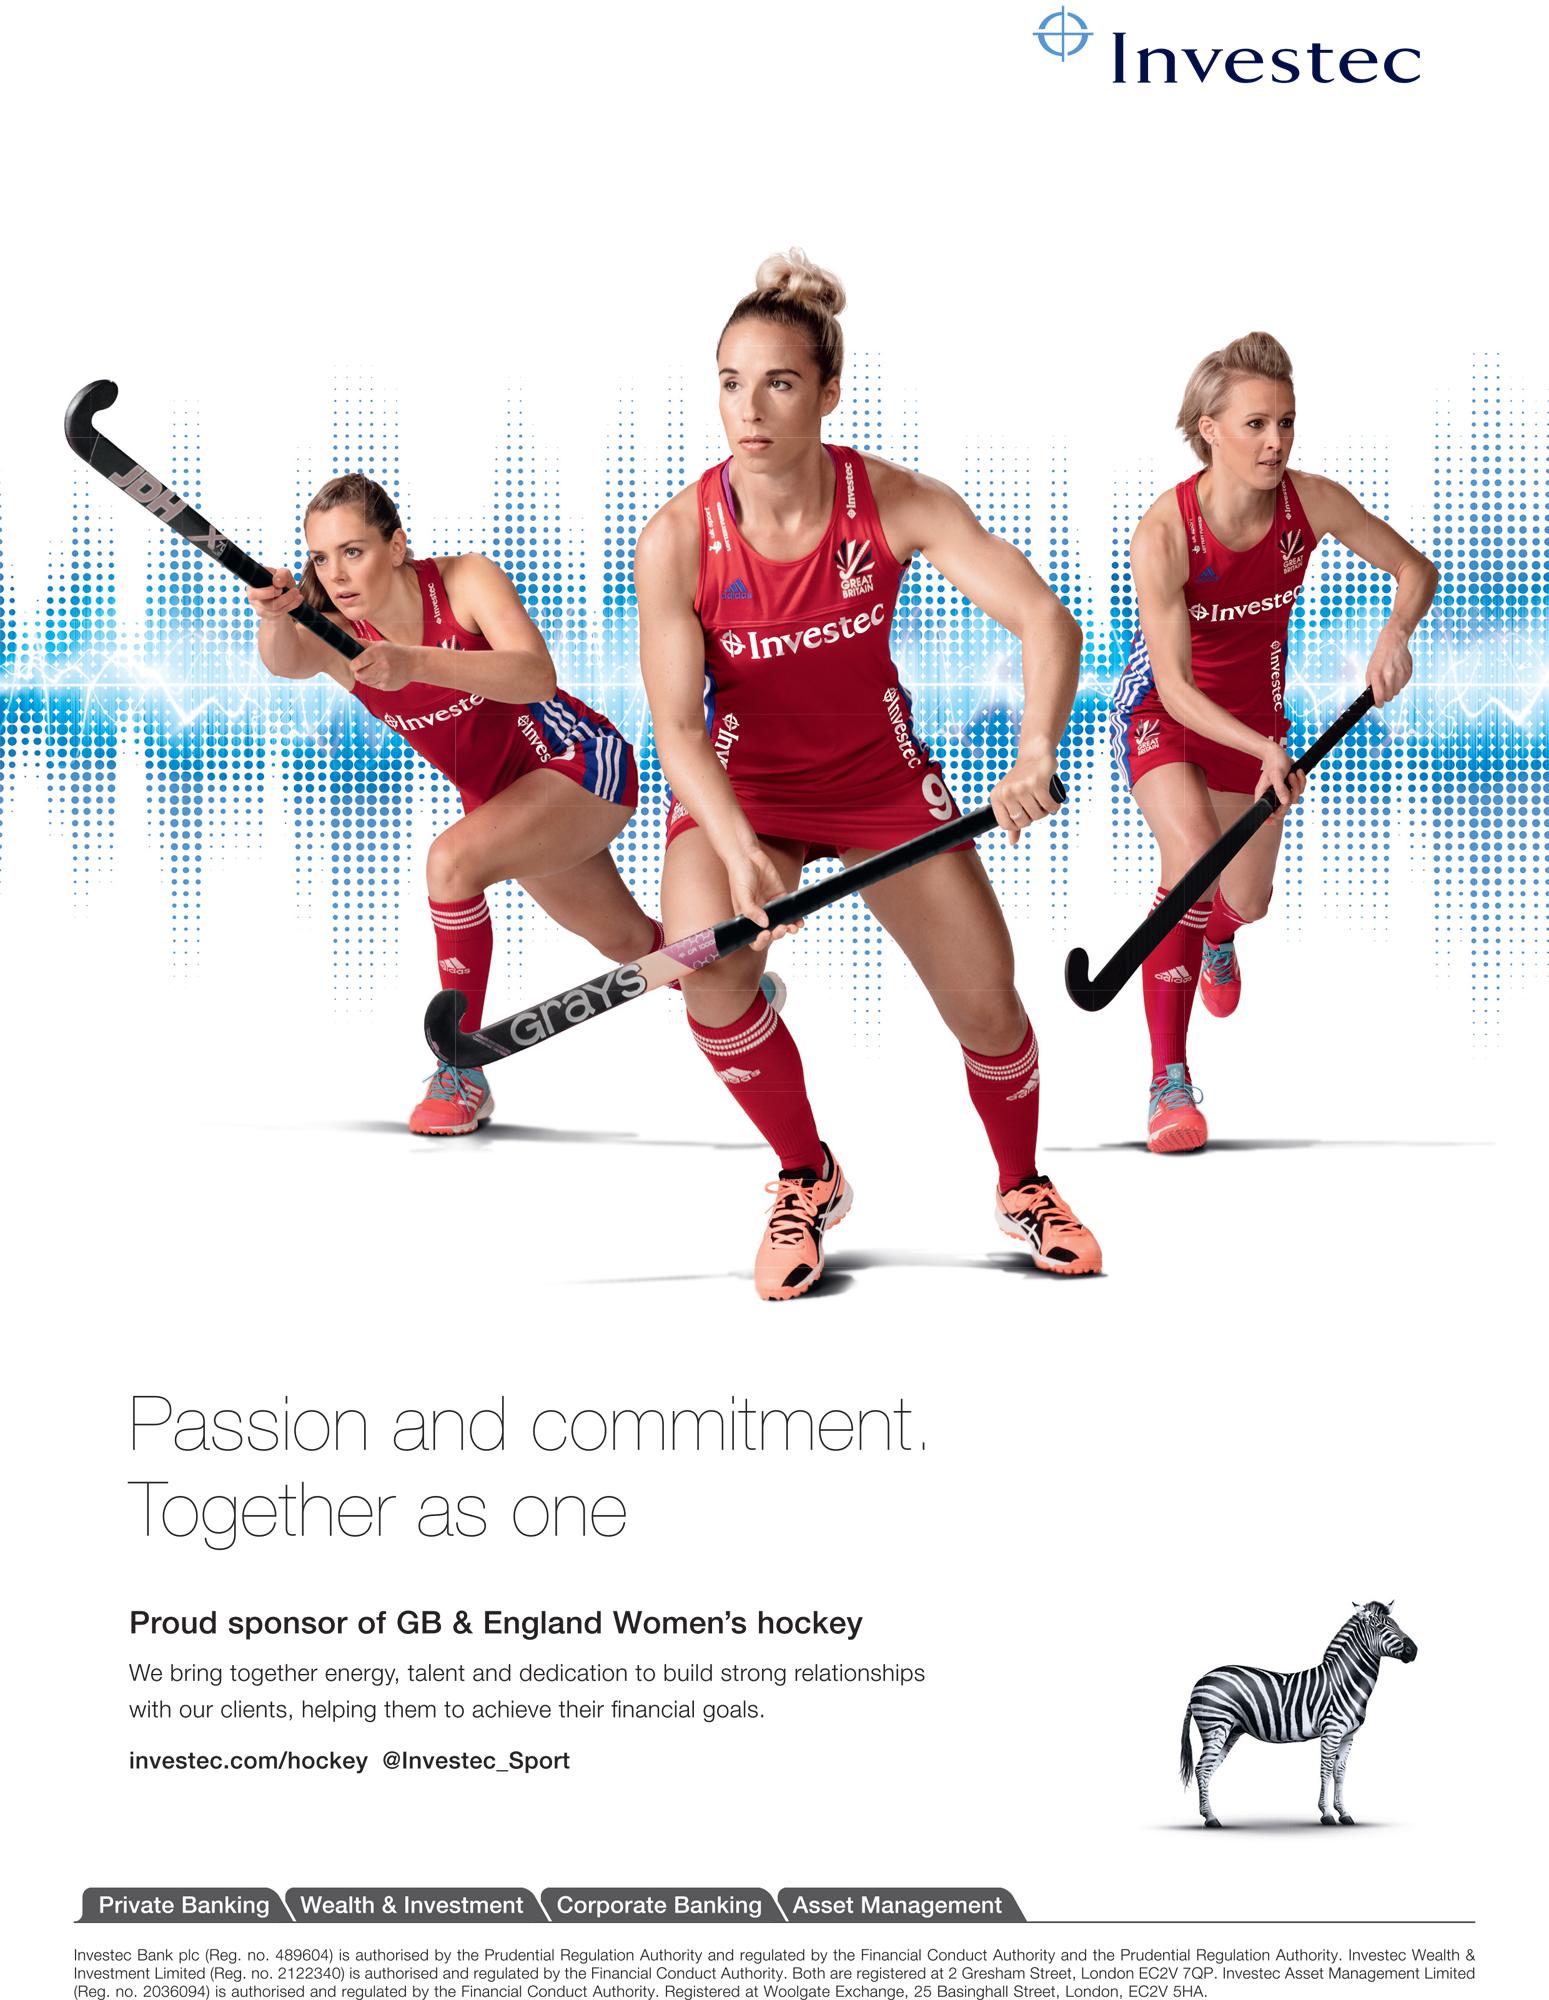 C39365_Group_Hockey_England-programme_297x210_Jul17_v1_TS.jpg